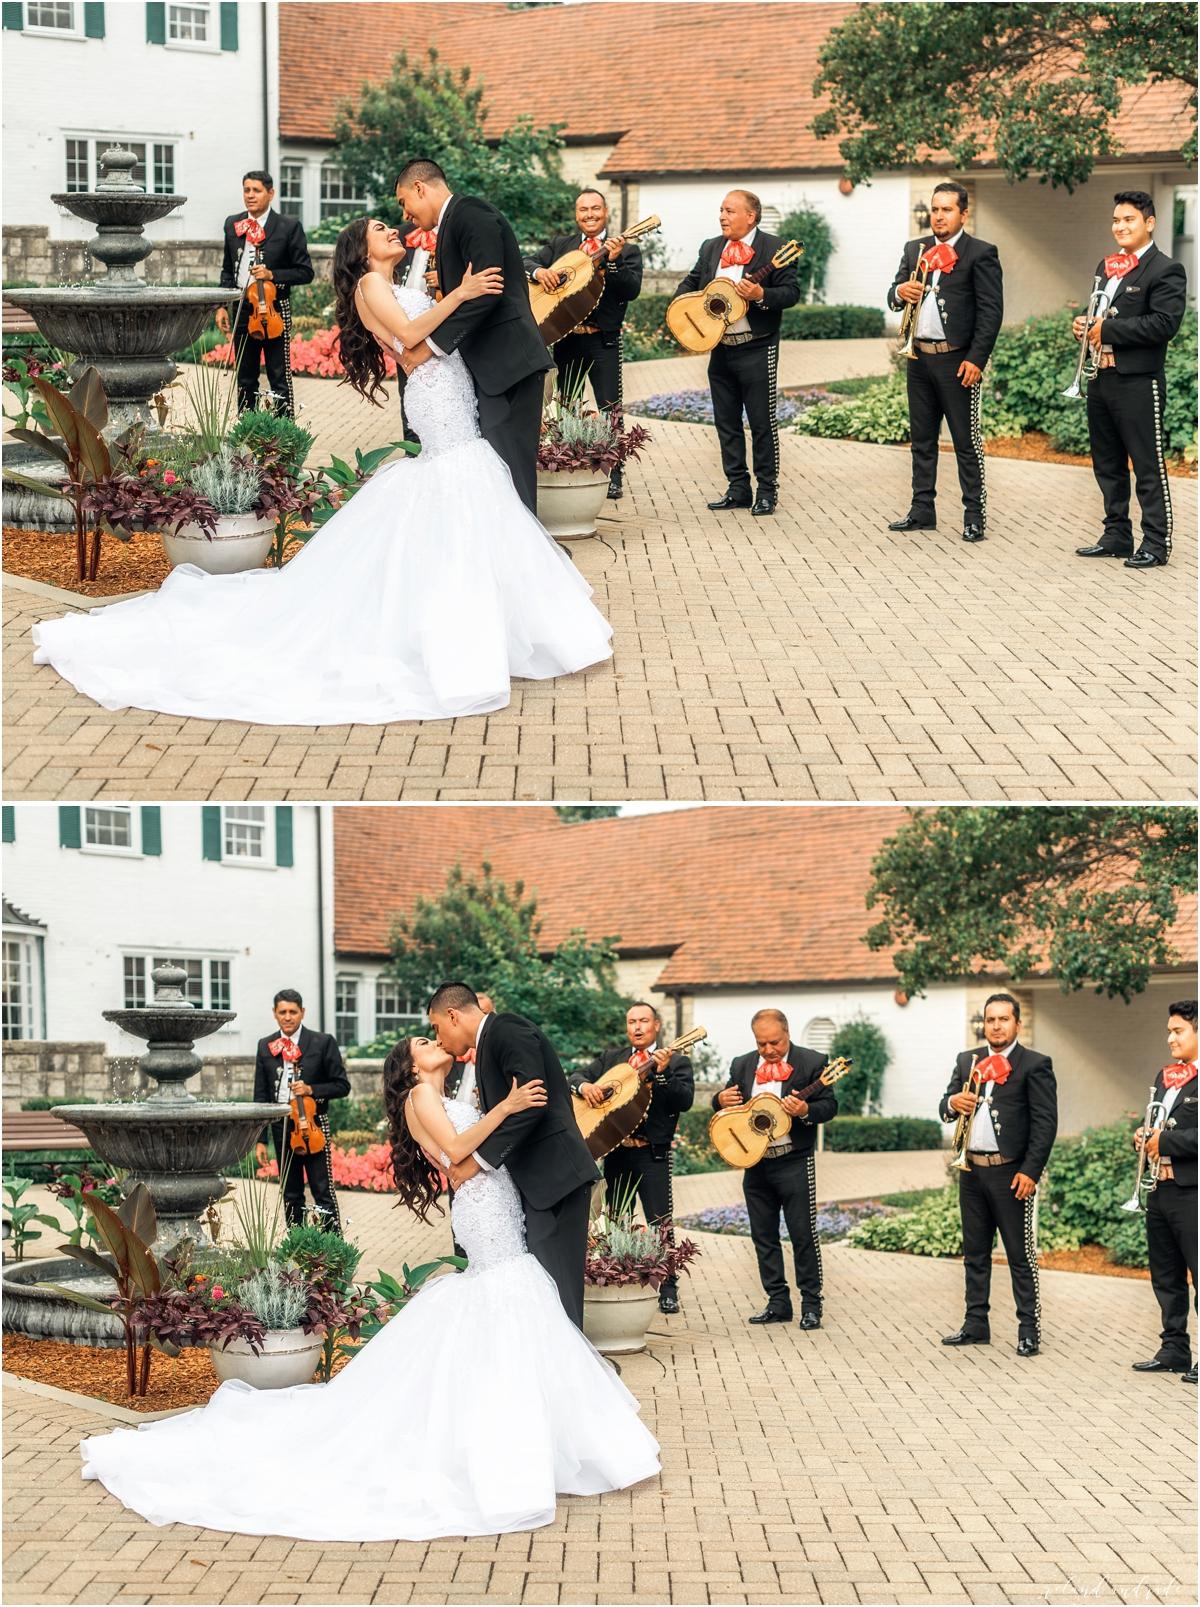 Danada House Wedding Photography Wheaton Illinois - Chicago Wedding Photography_0060.jpg